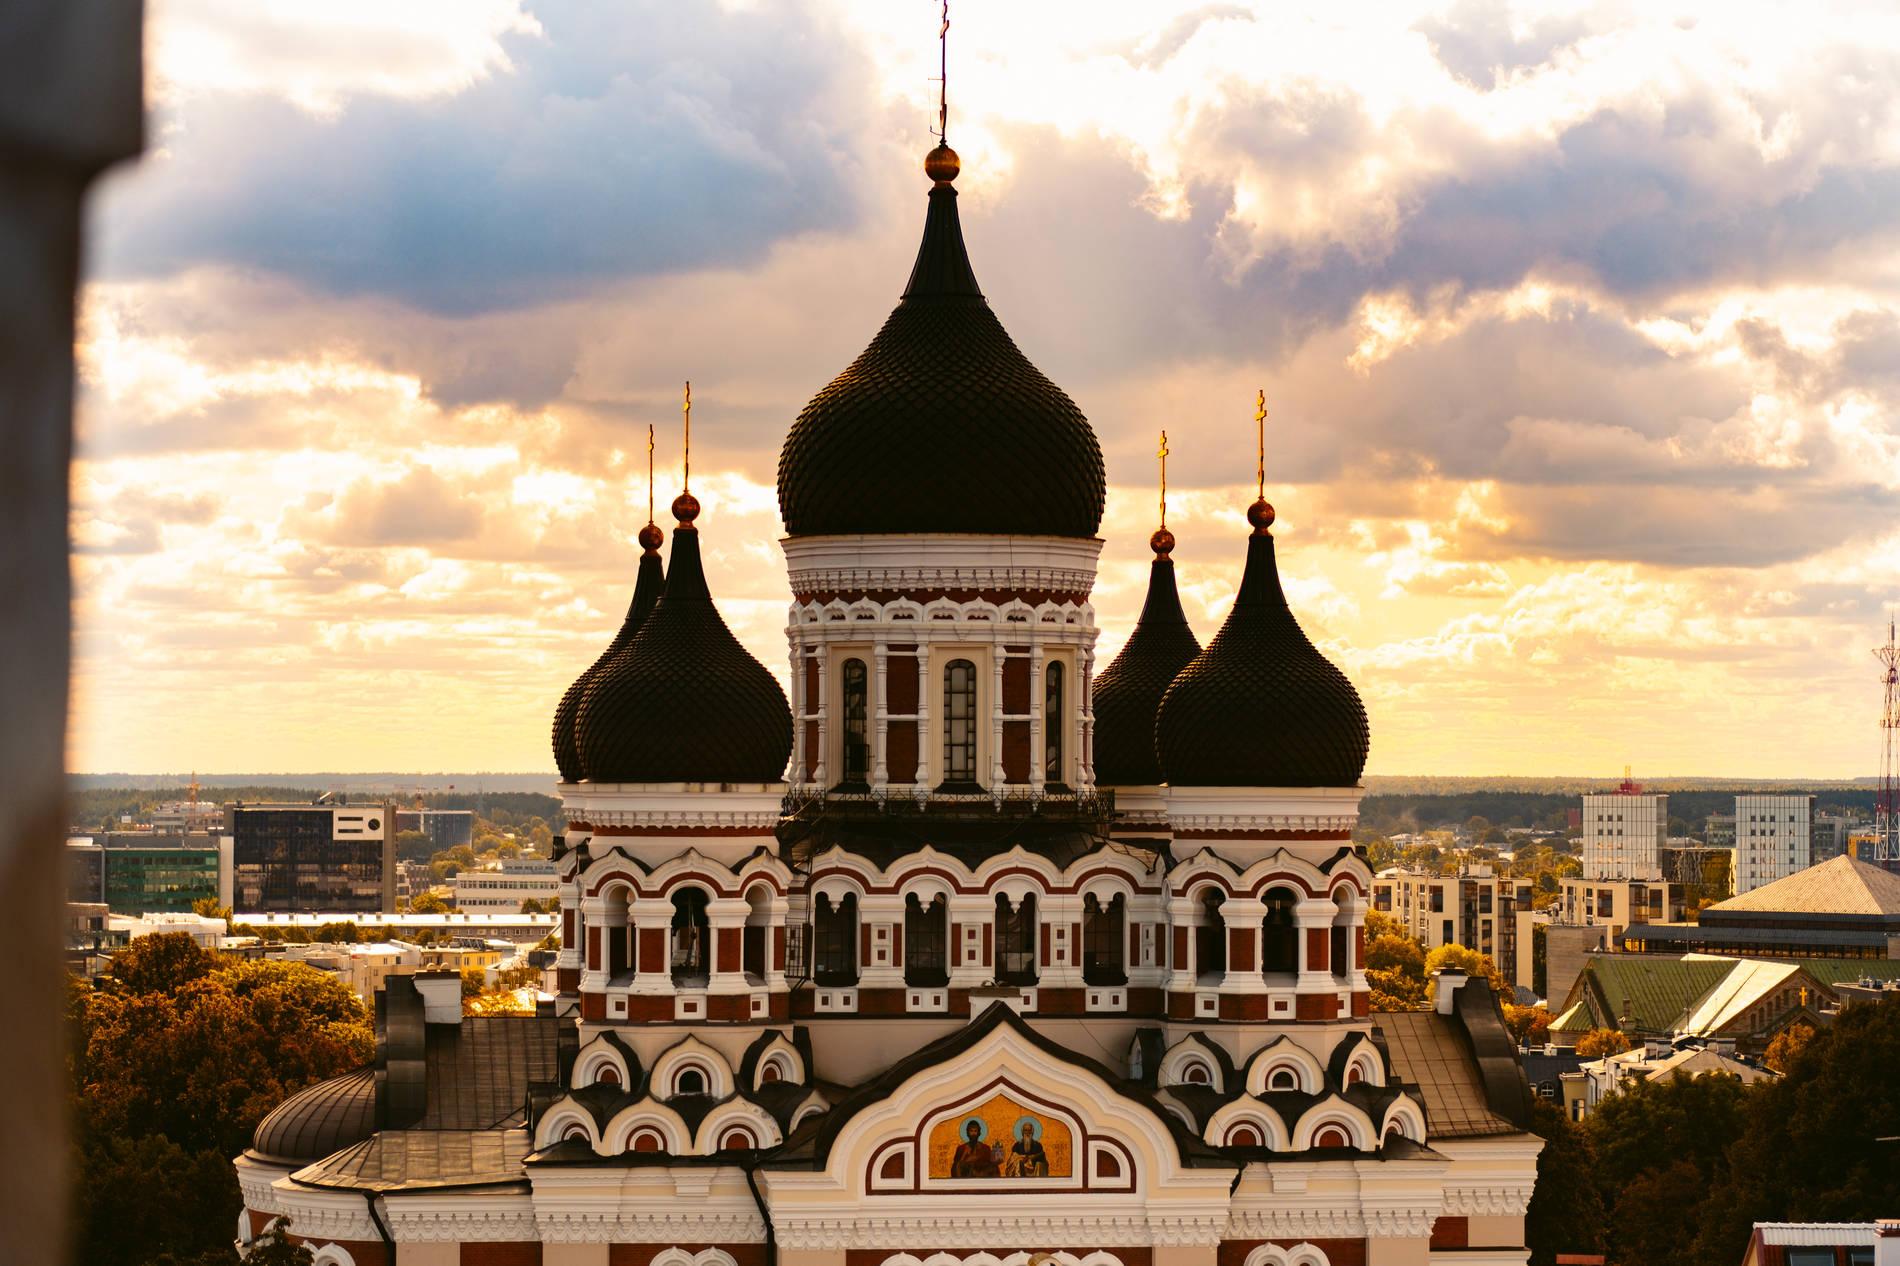 St. Alexander Nevsky Cathedral in Tallinn, Estonia